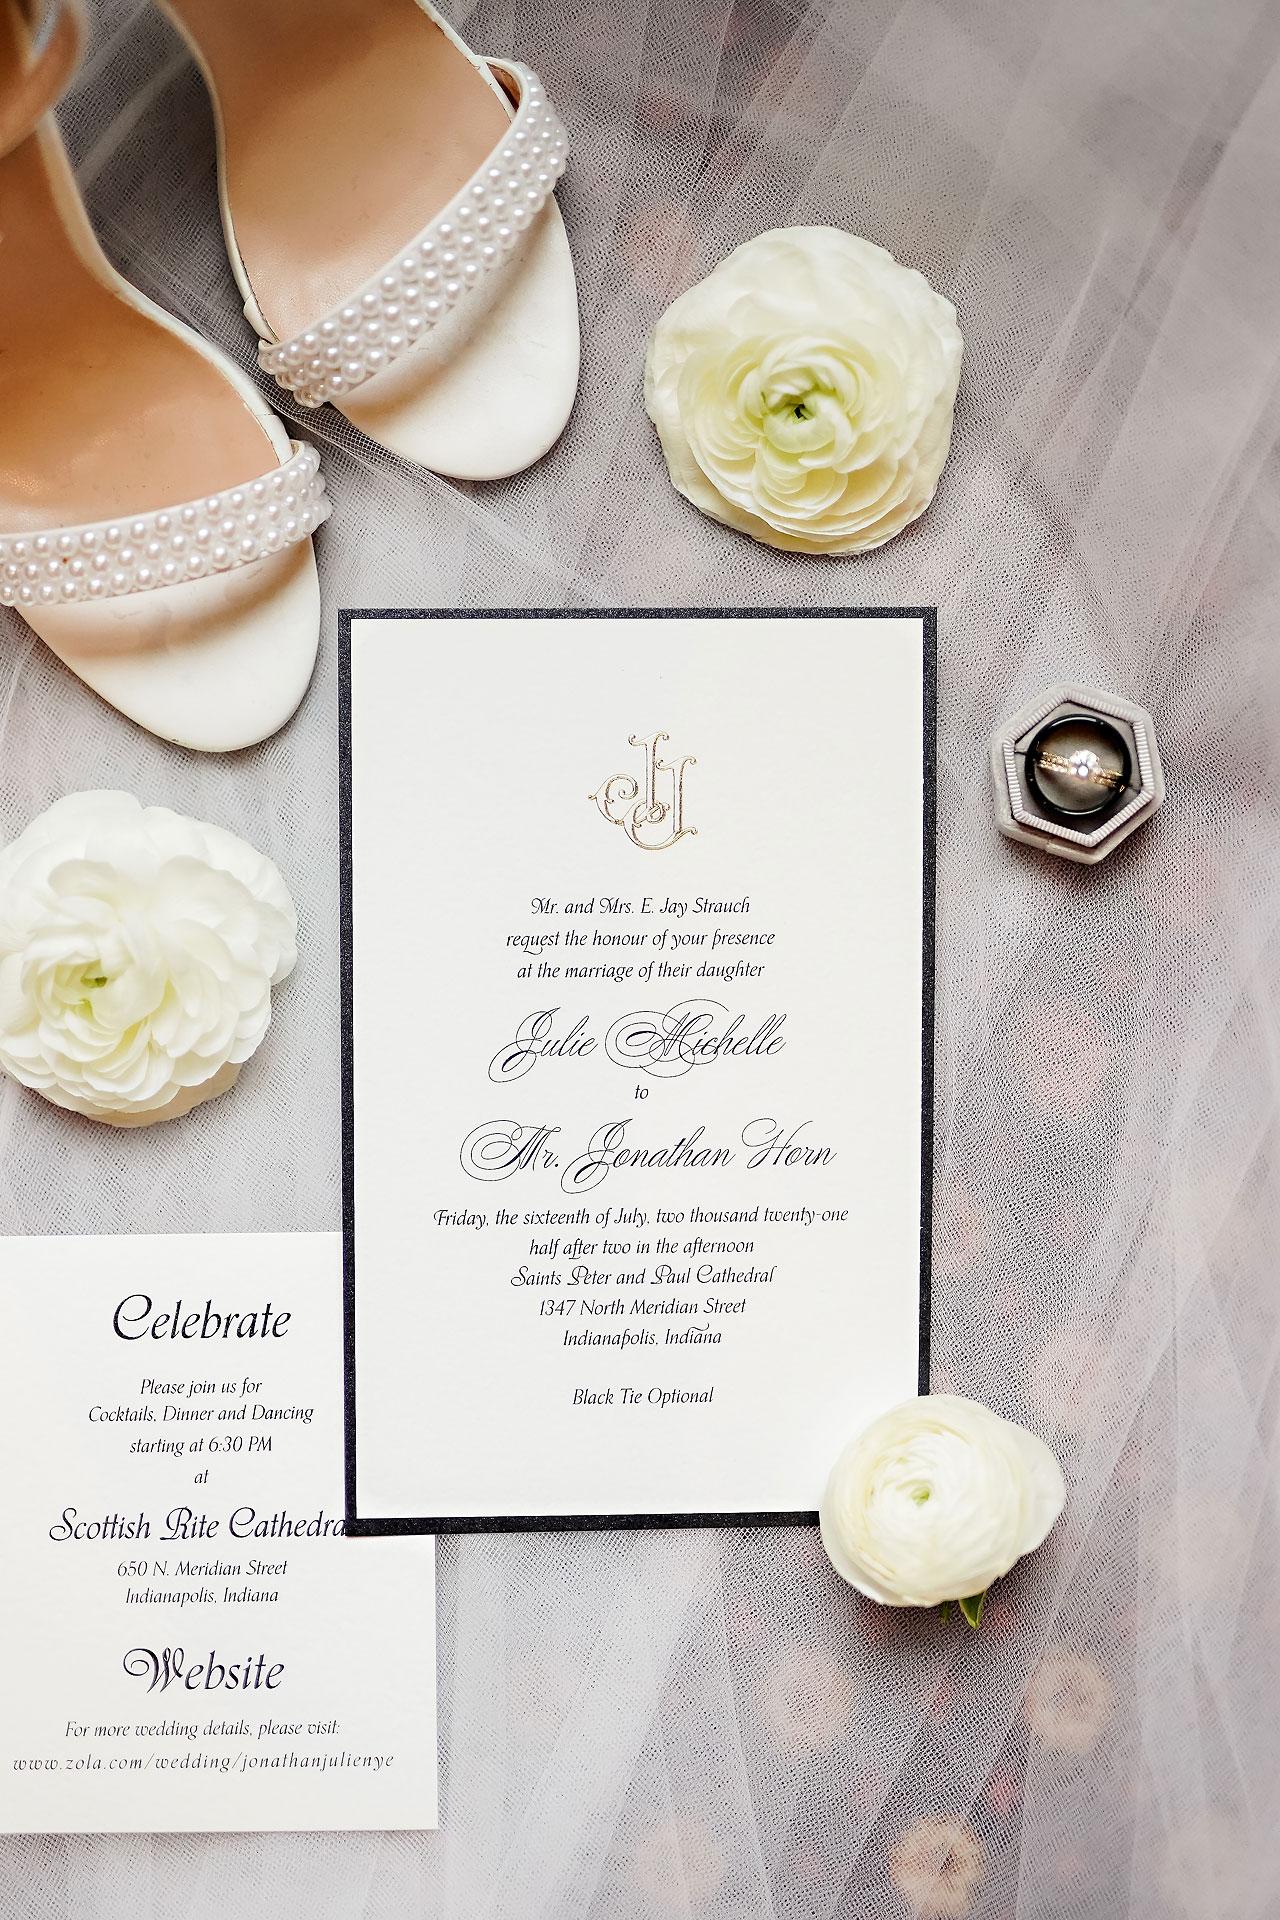 Julie Jonathan St Johns Scottish Rite Cathedral Indianapolis Wedding 001